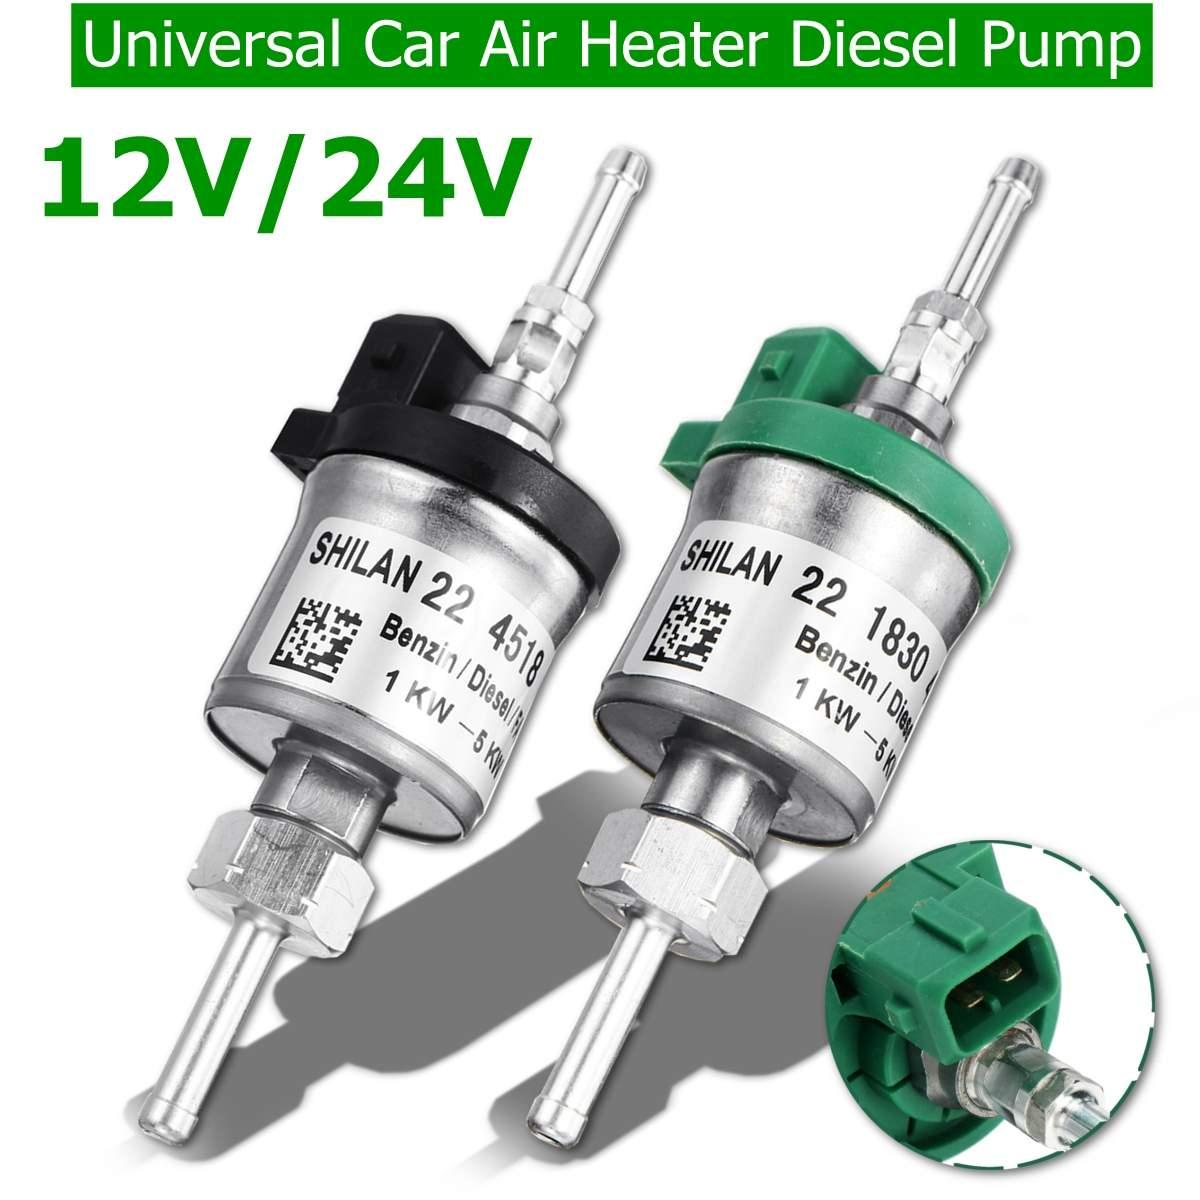 Universal Gas Diesel Fuel Pump,Parking Heater Pump for Webasto Ws Electric Fuel Pump,Heater Oil Fuel Pump for Air Parking Heater 2000W 5000W 12V//24V Heater Pump